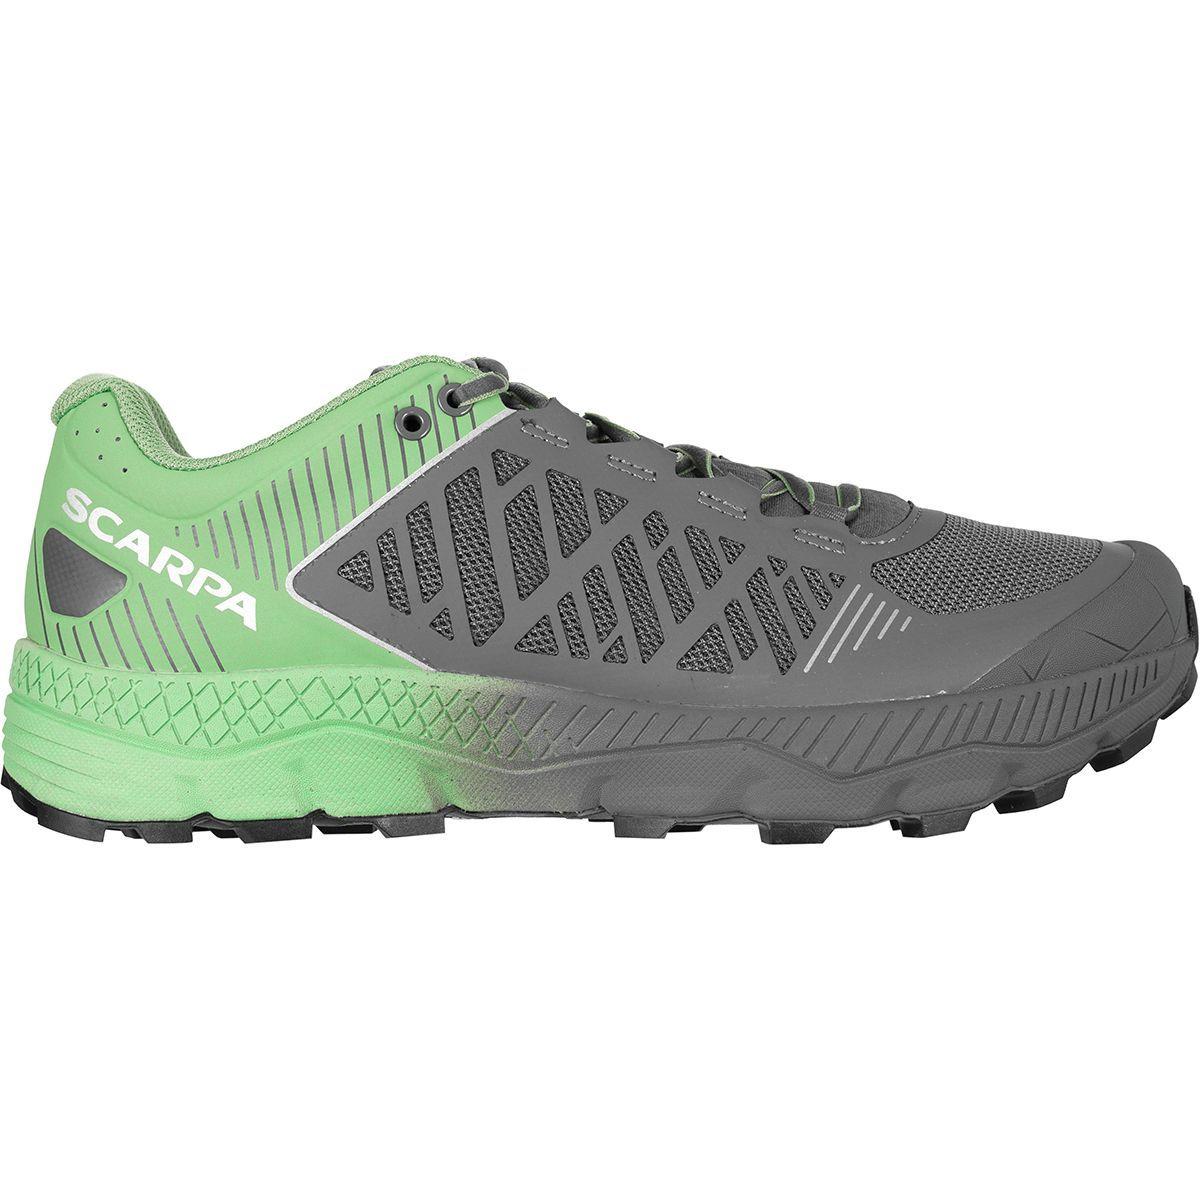 Scarpa Spin Ultra Running Shoe - Women's